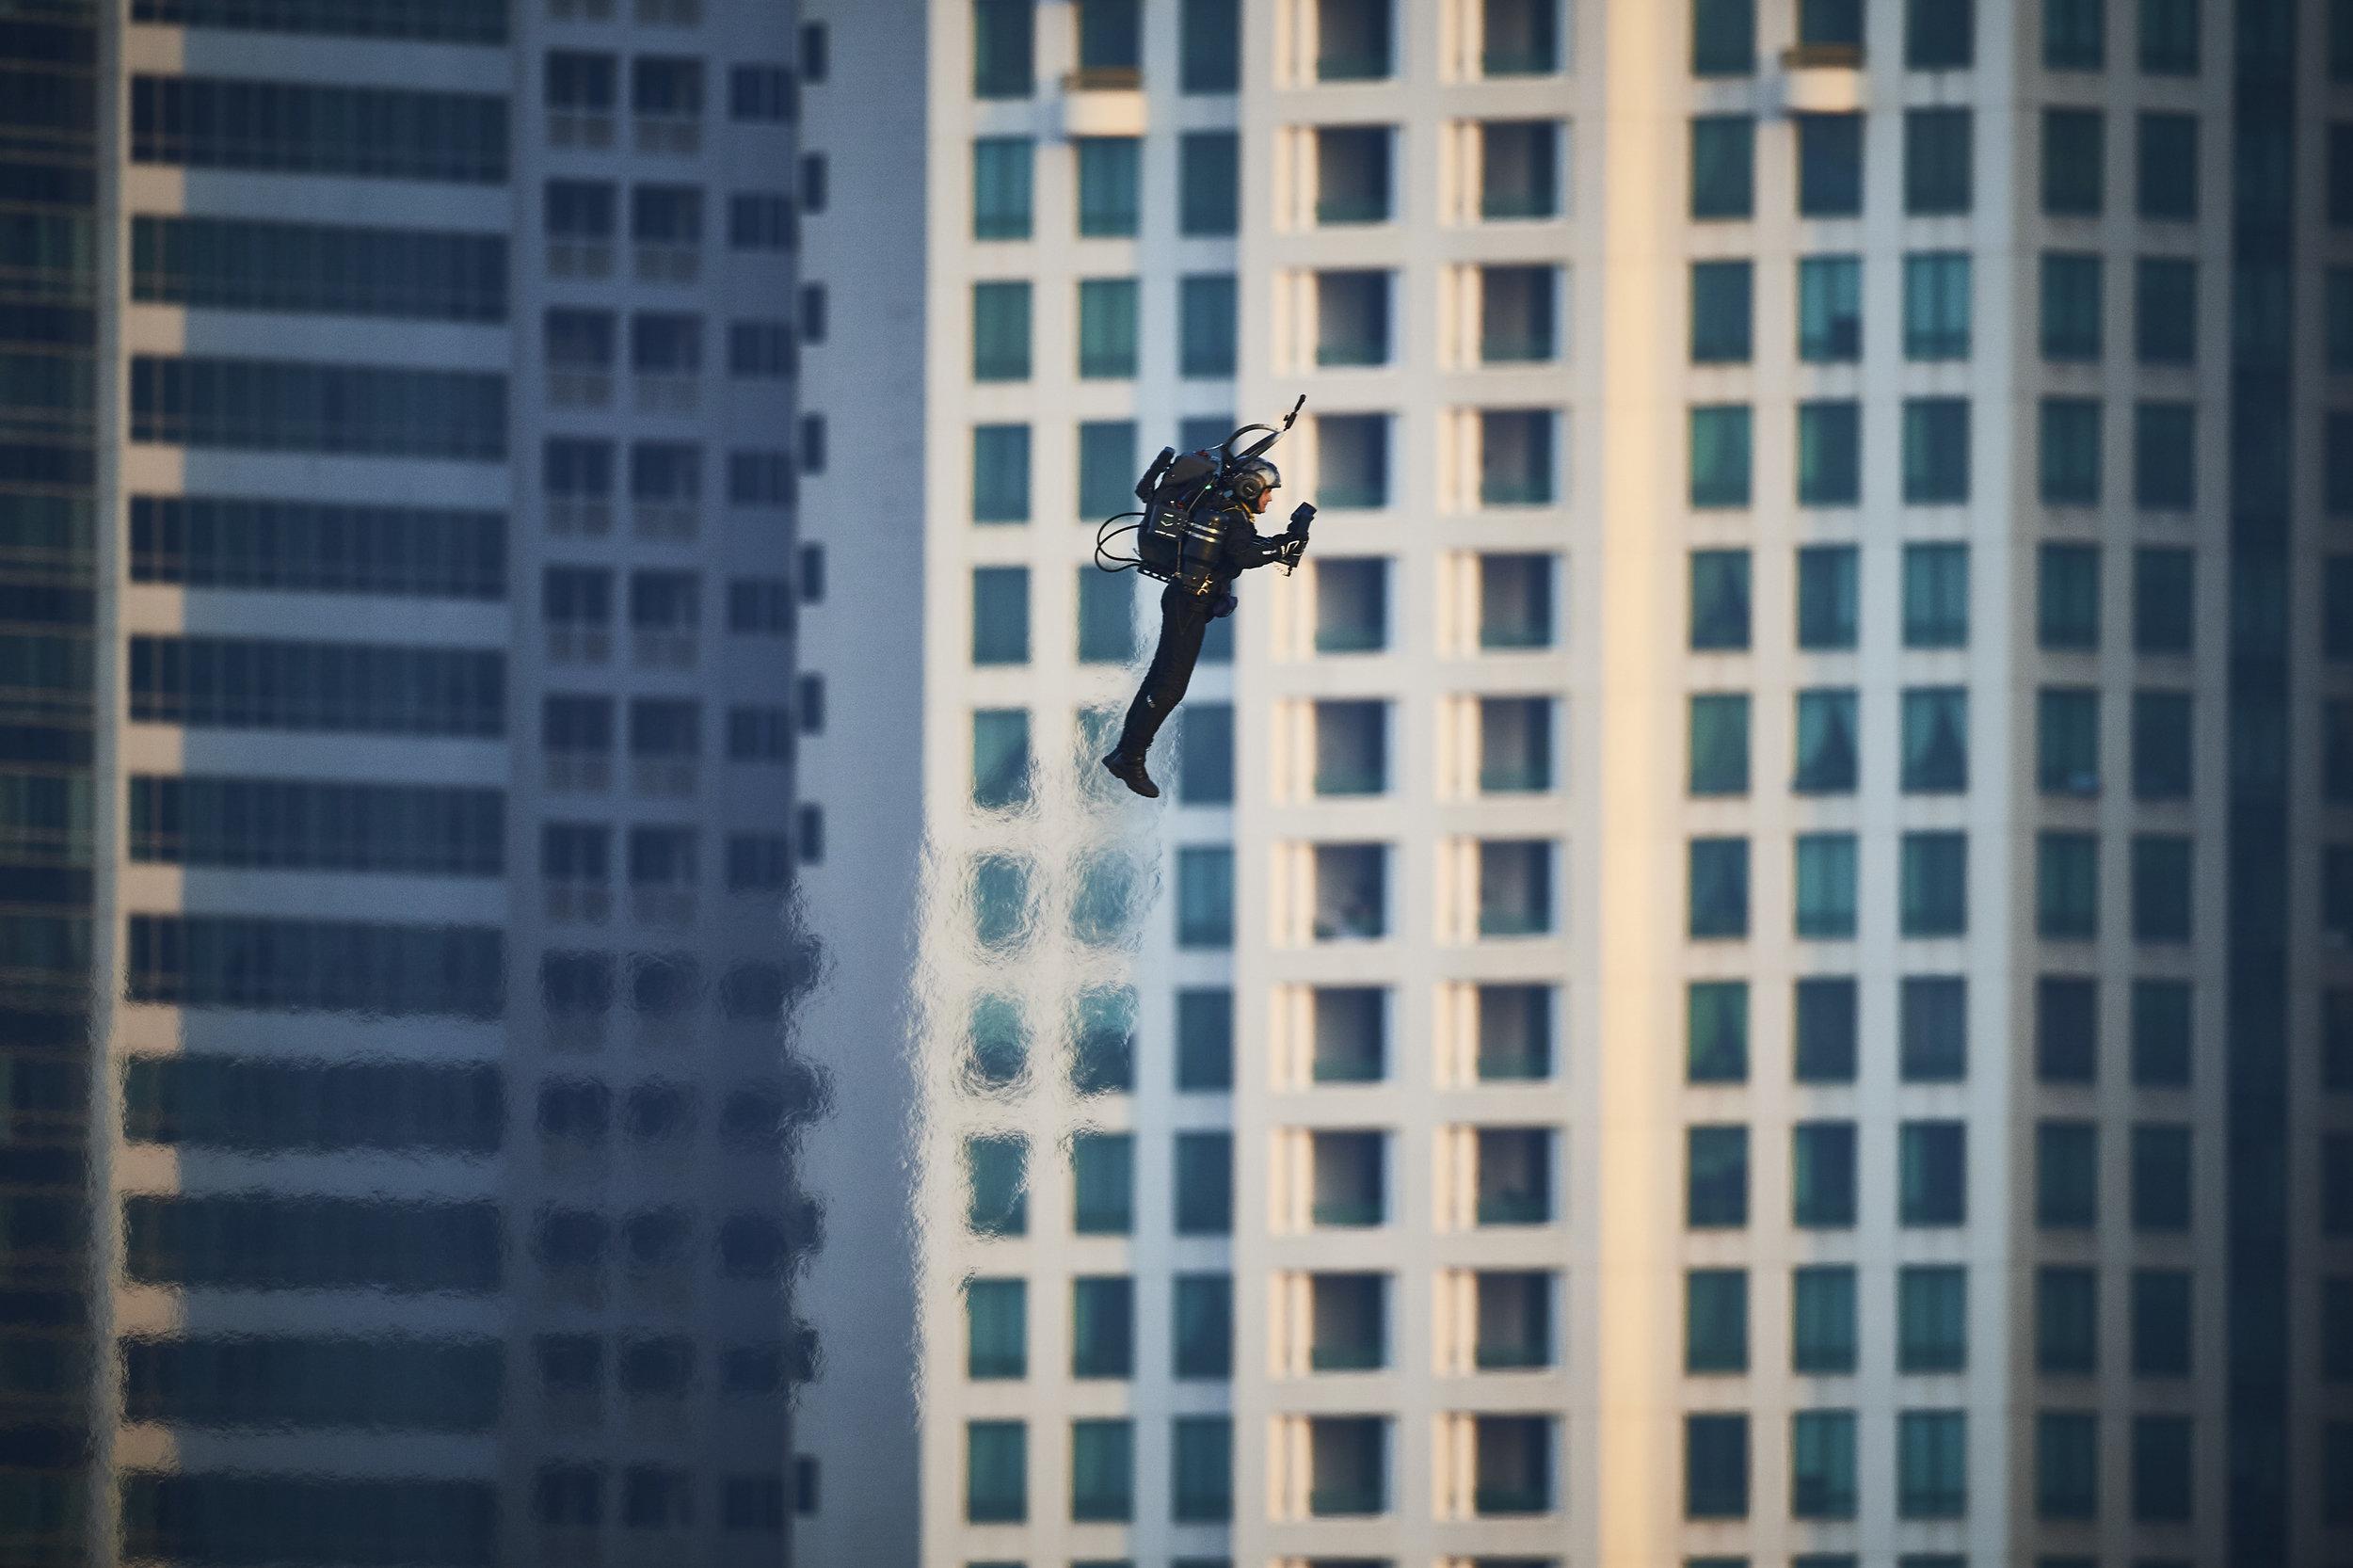 008_Own the Sky_City Flight_©OTS Films.jpg